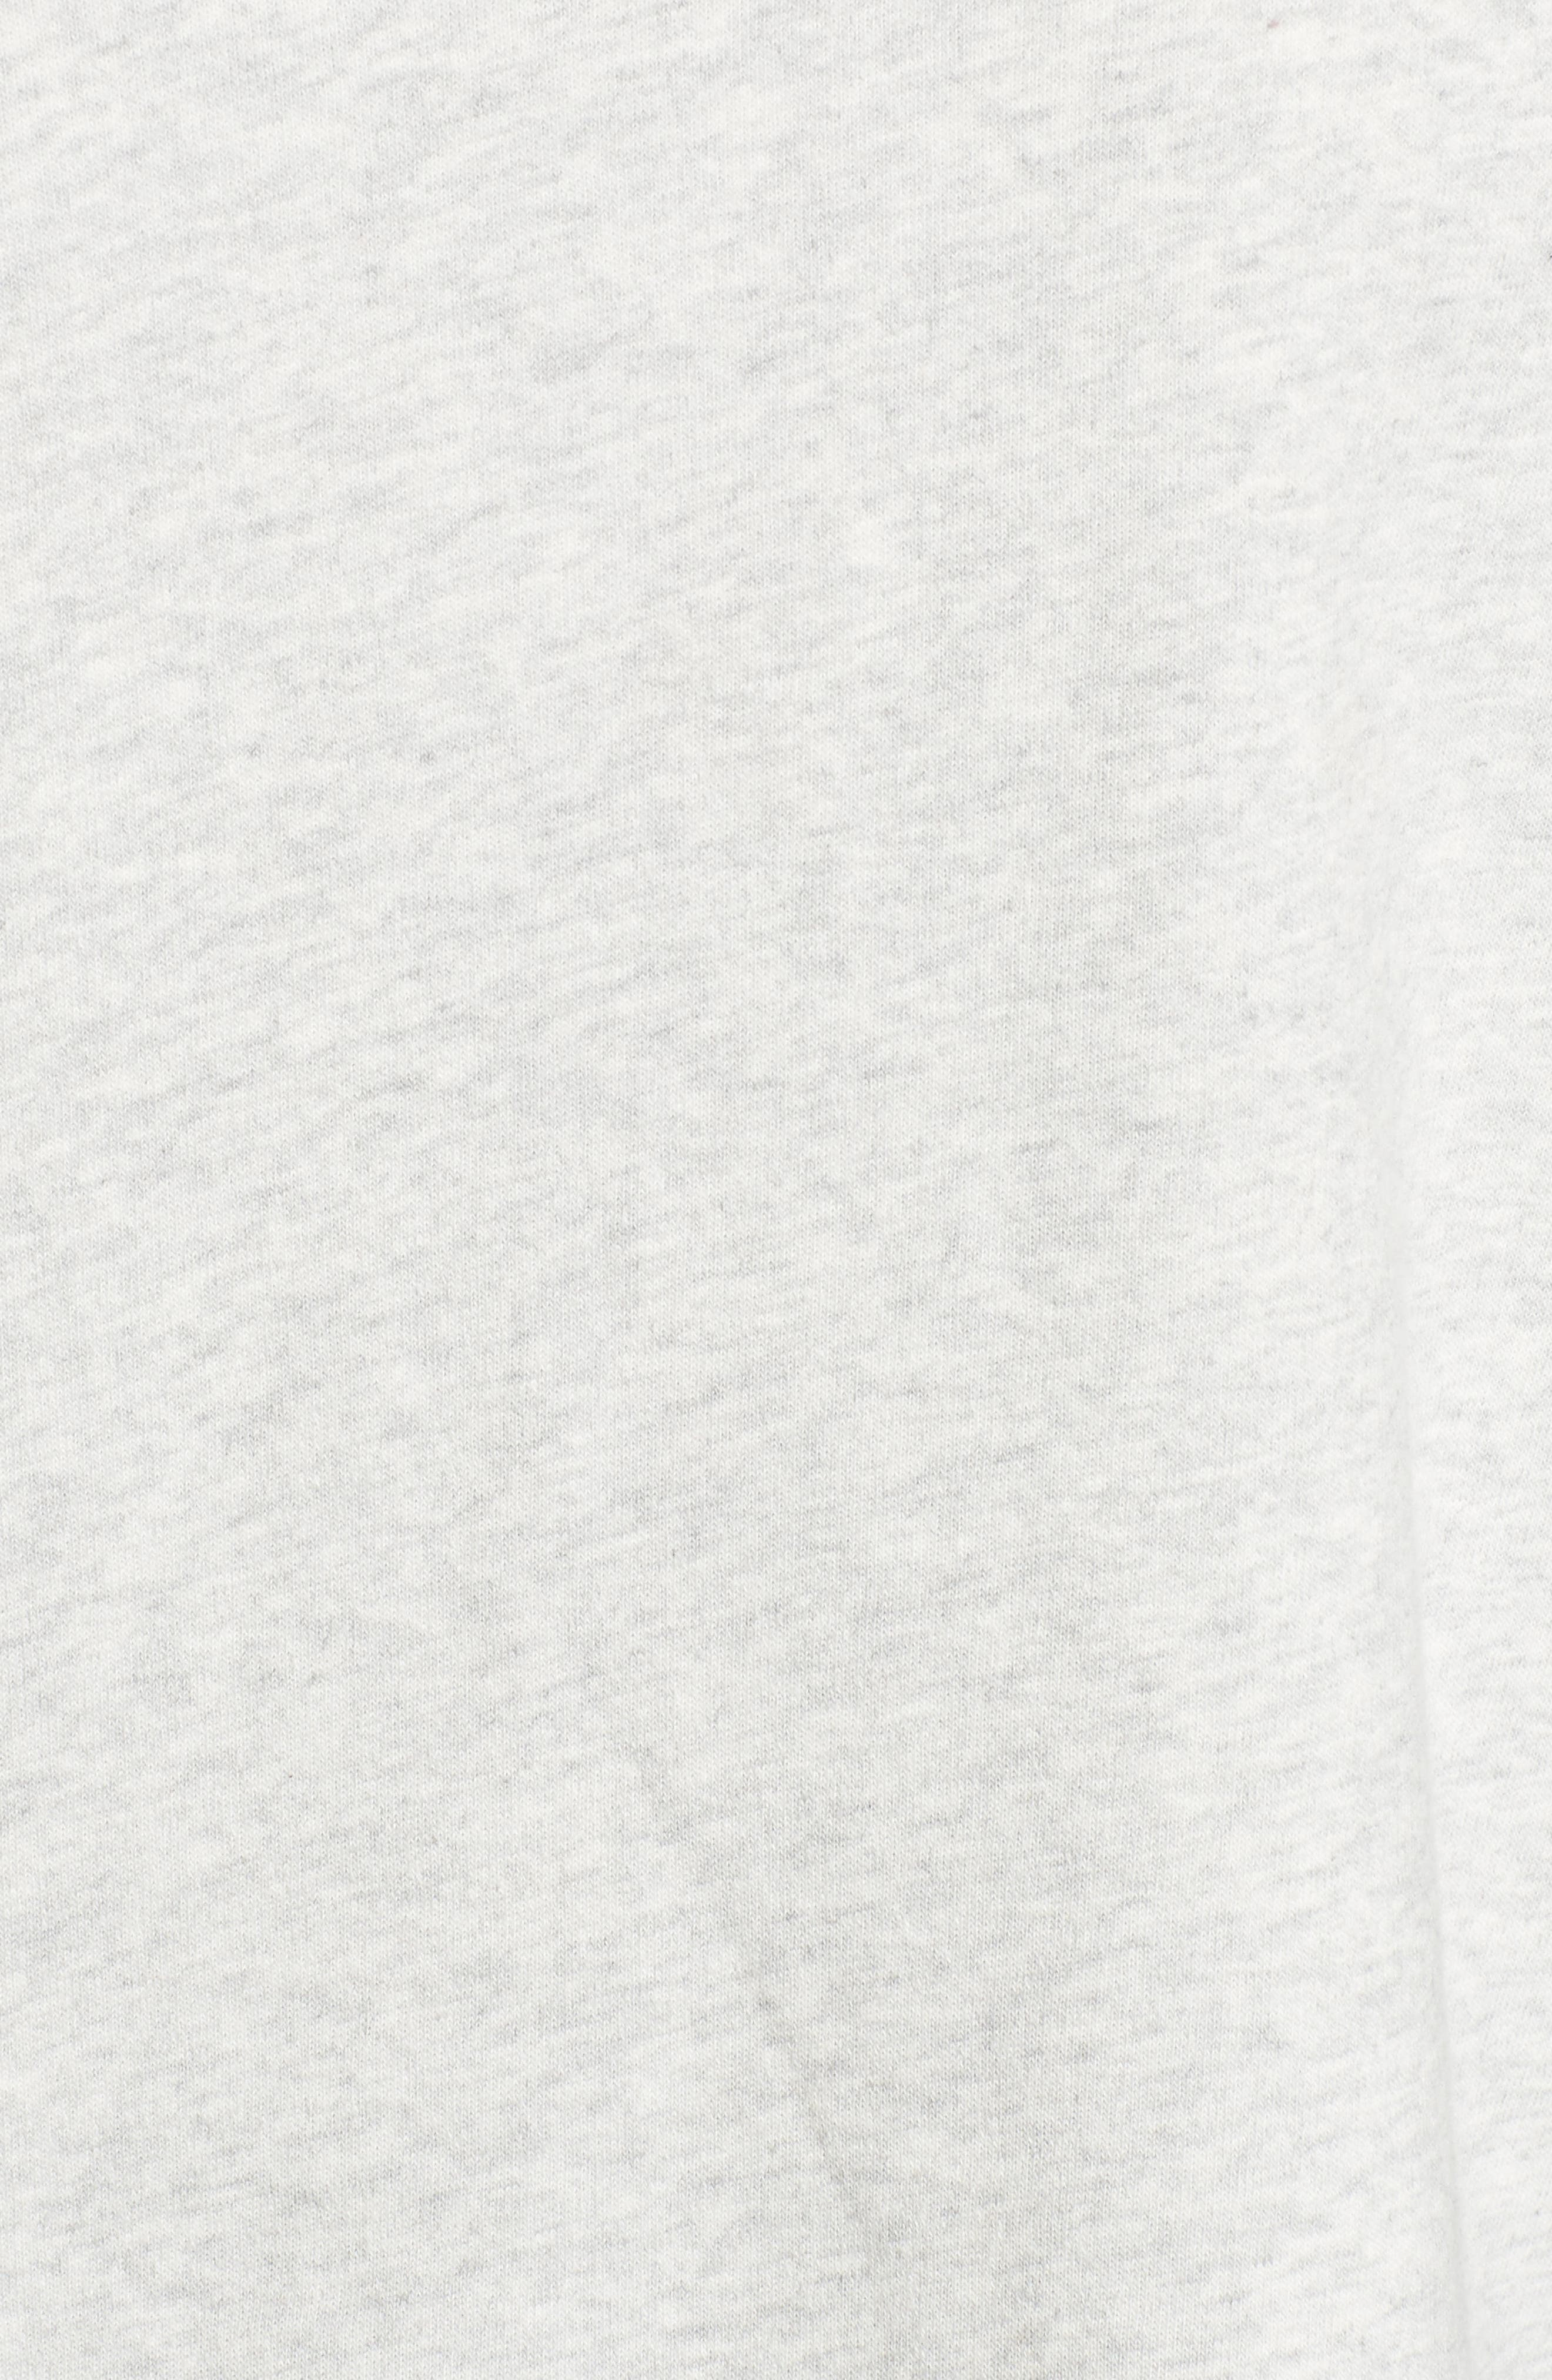 Embellished Bell Sleeve Sweatshirt,                             Alternate thumbnail 5, color,                             050